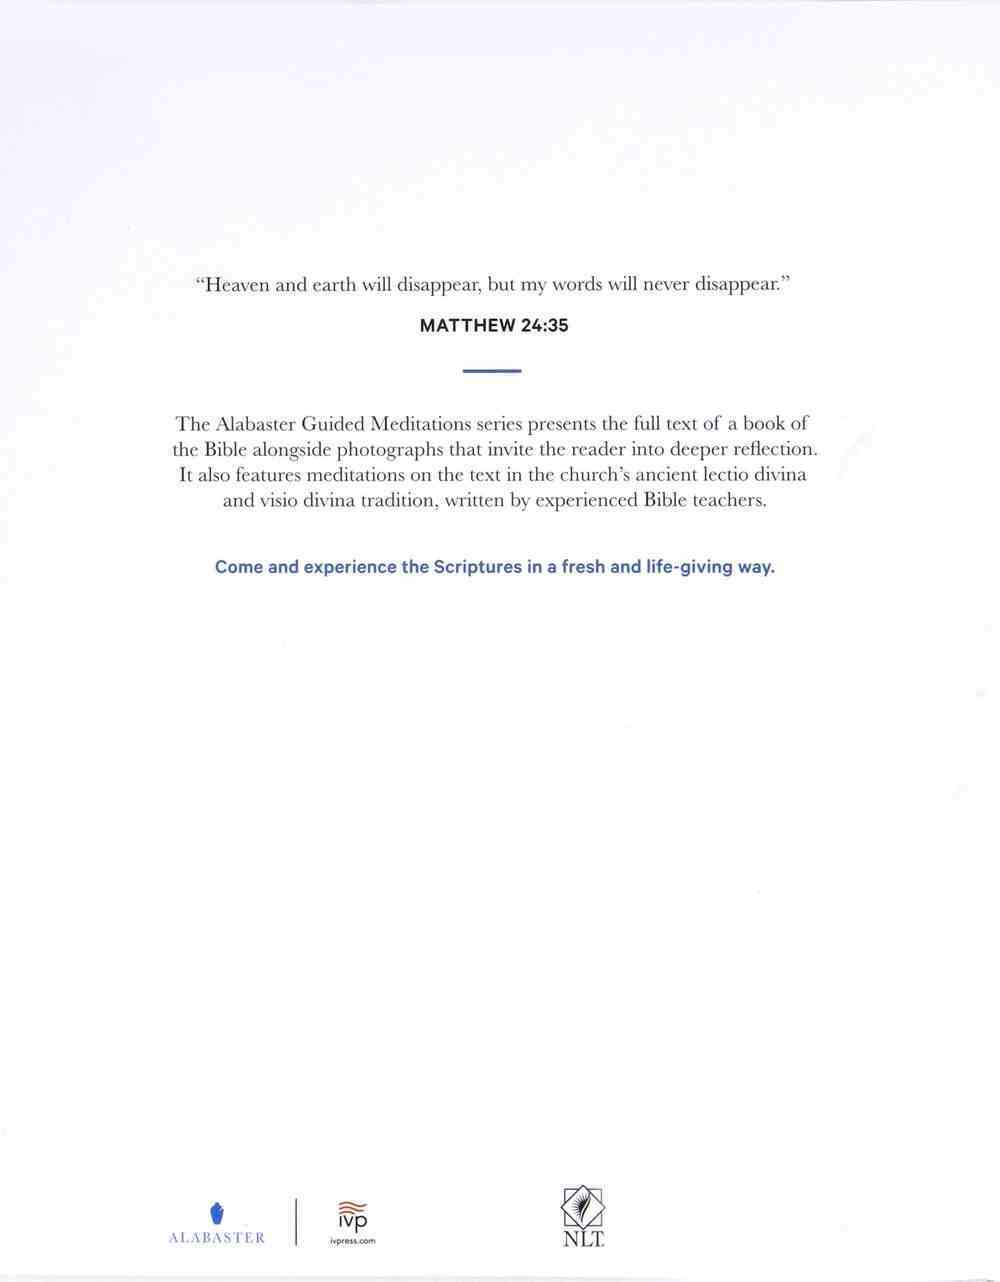 NLT Alabaster Matthew: Read, Reflect, Respond, Rest (Alabaster Guided Meditations Series) Paperback